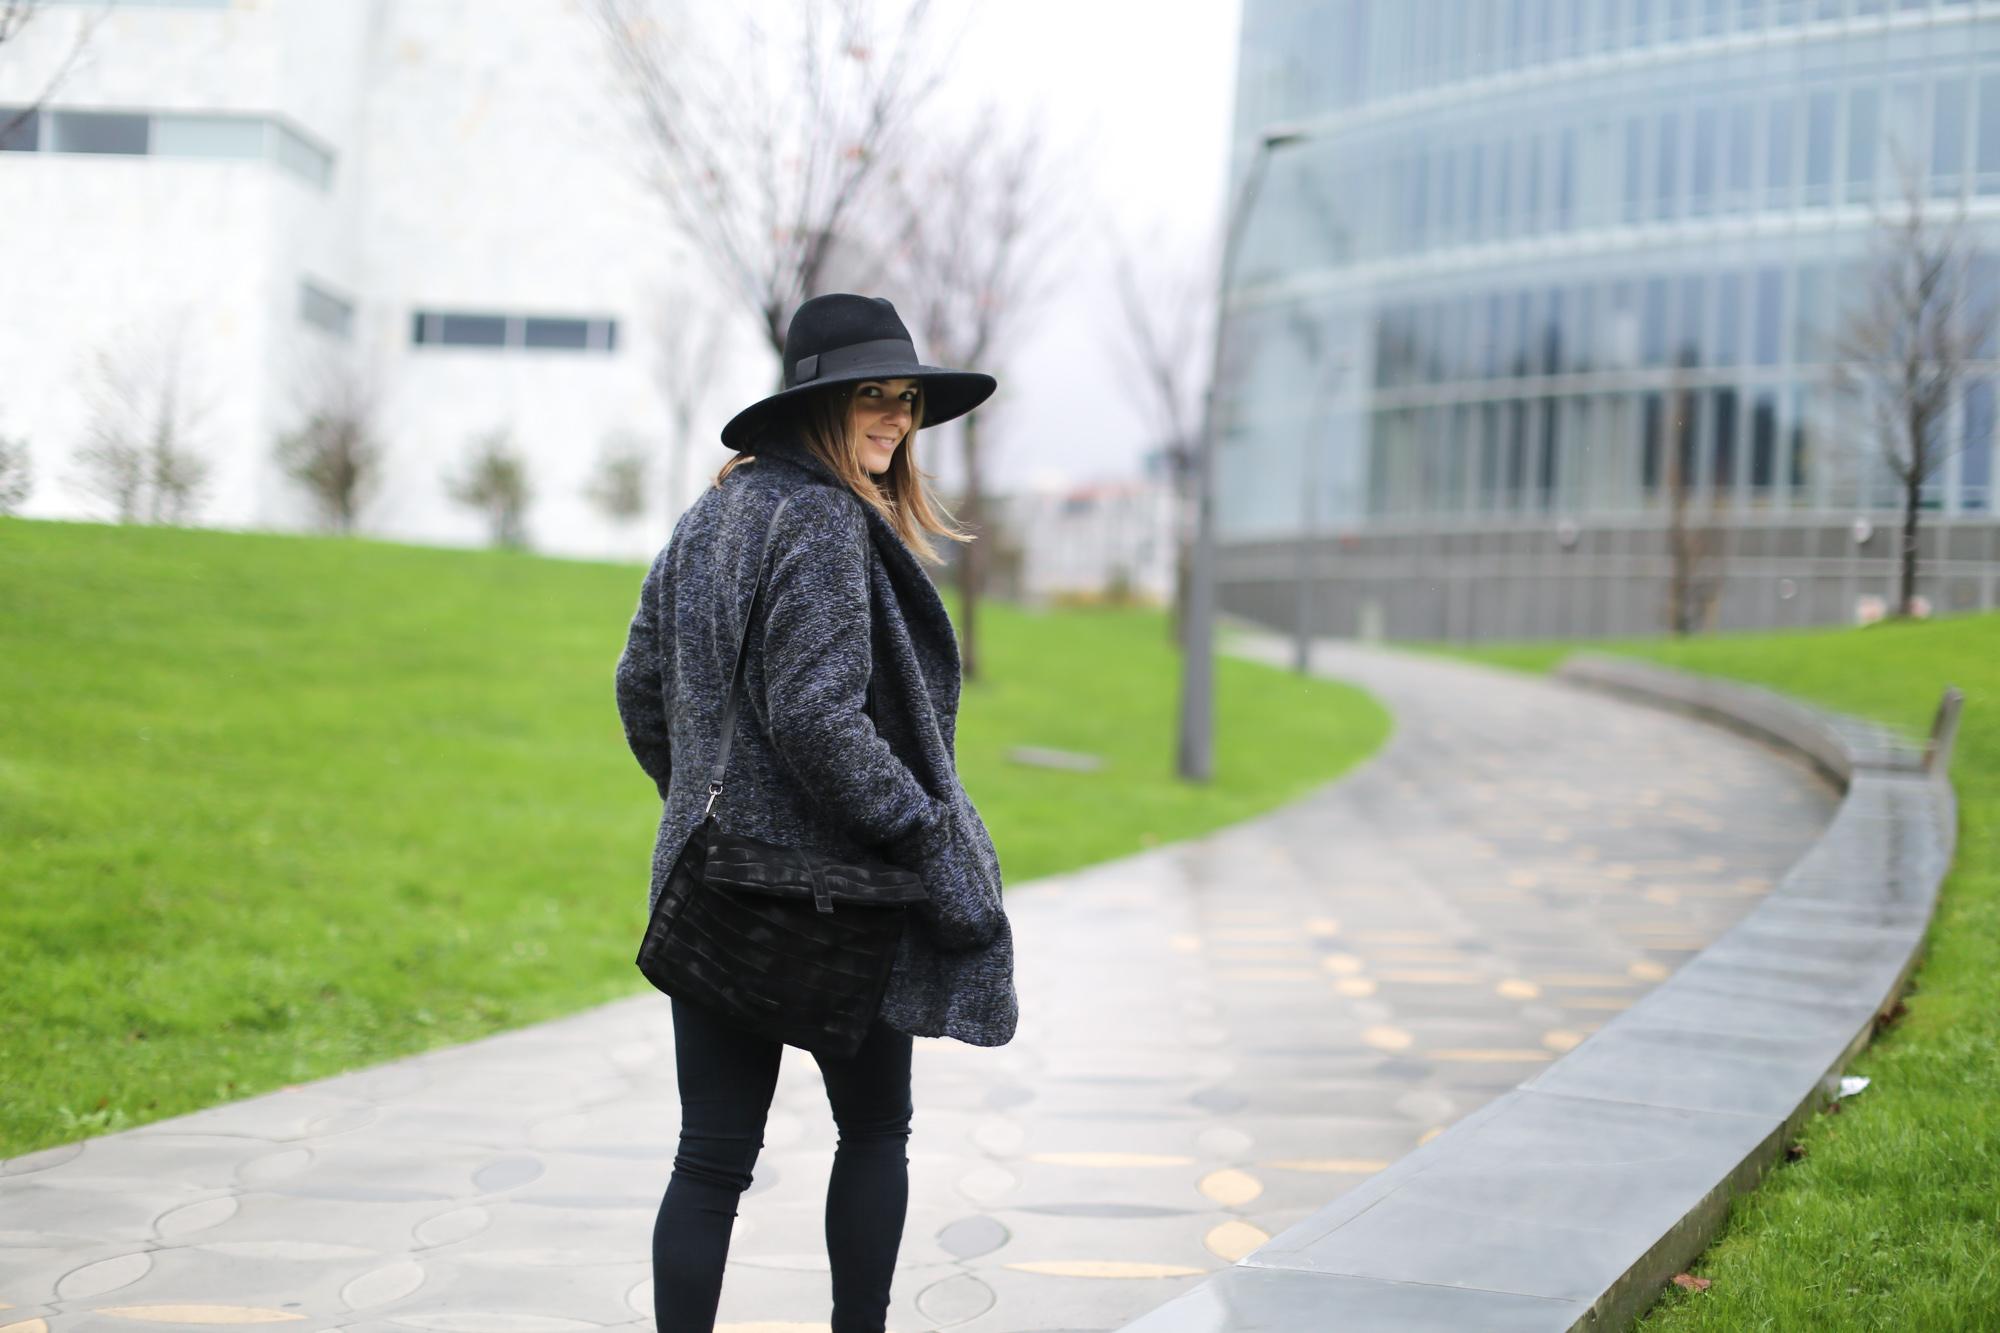 Clochet-streetstyle-mango-jacket-fedora-hat-kitten-heels-6